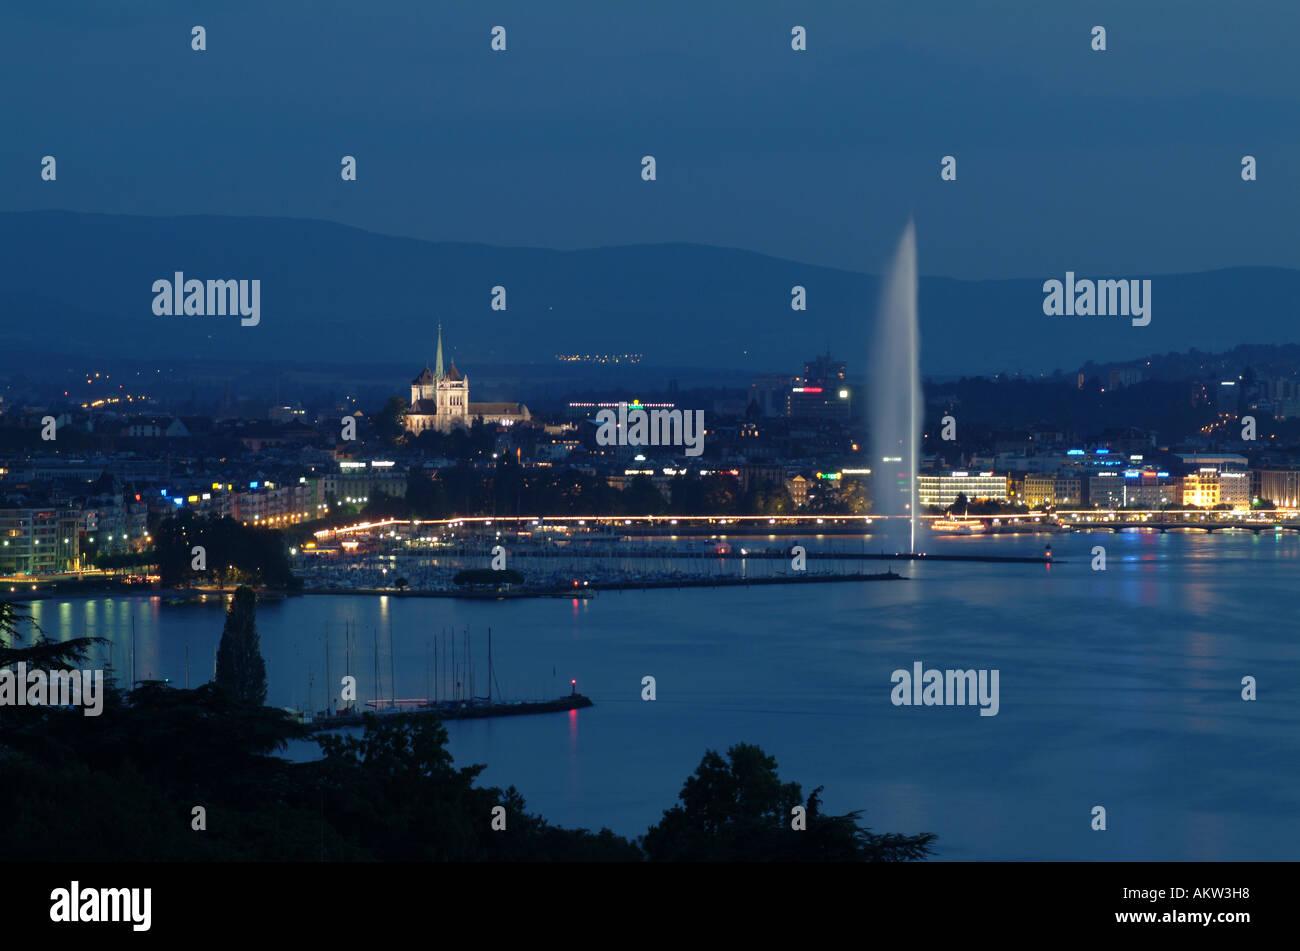 Geneva. Genève. Jet d'Eau. Lac Leman by night. - Stock Image